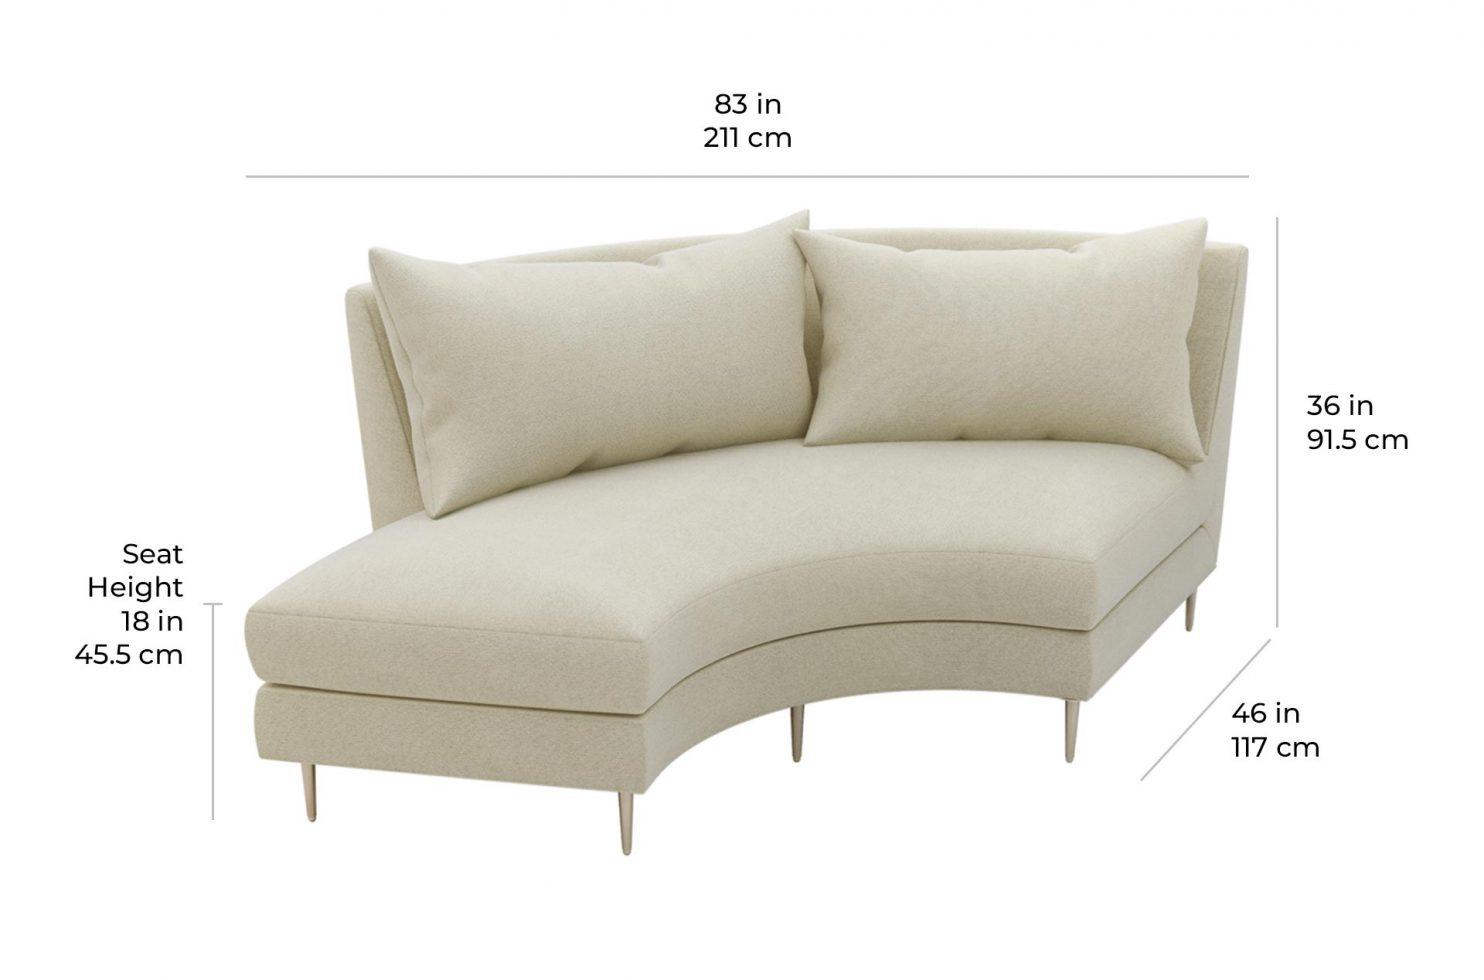 fizz mimosa armless sofa w bumper 105FT003P2 AS LSB scale dims